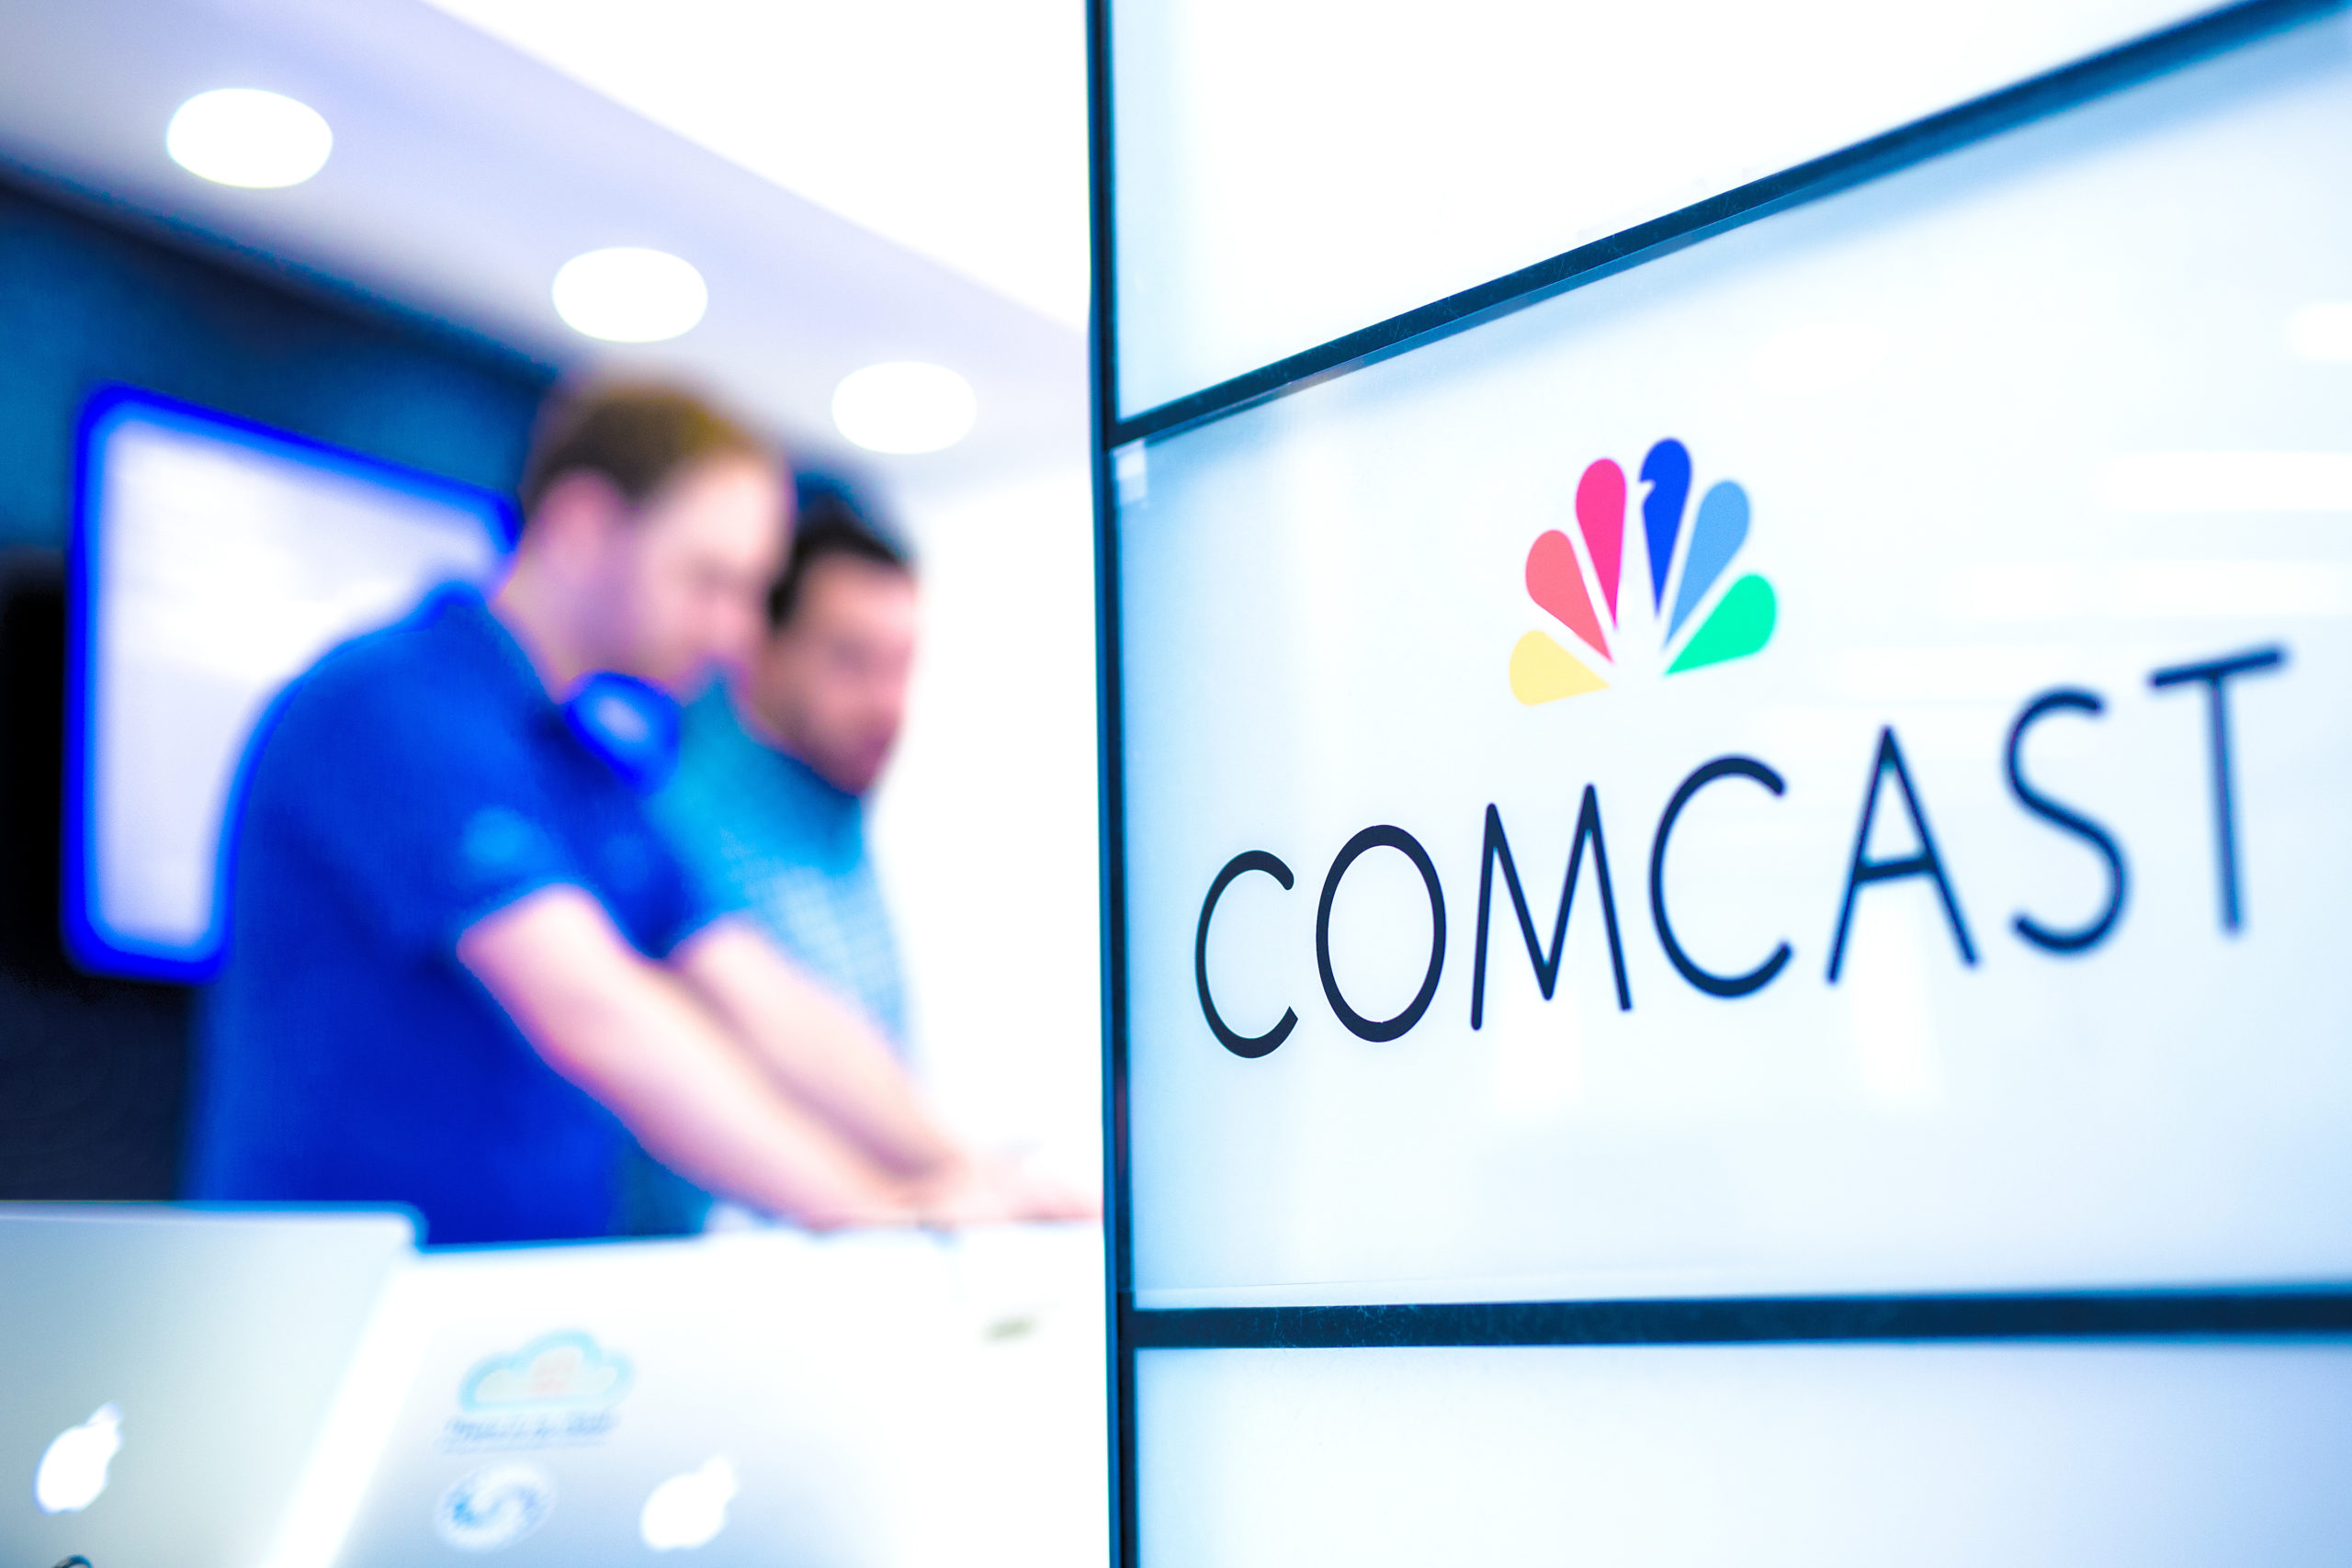 Comcast logo in forground